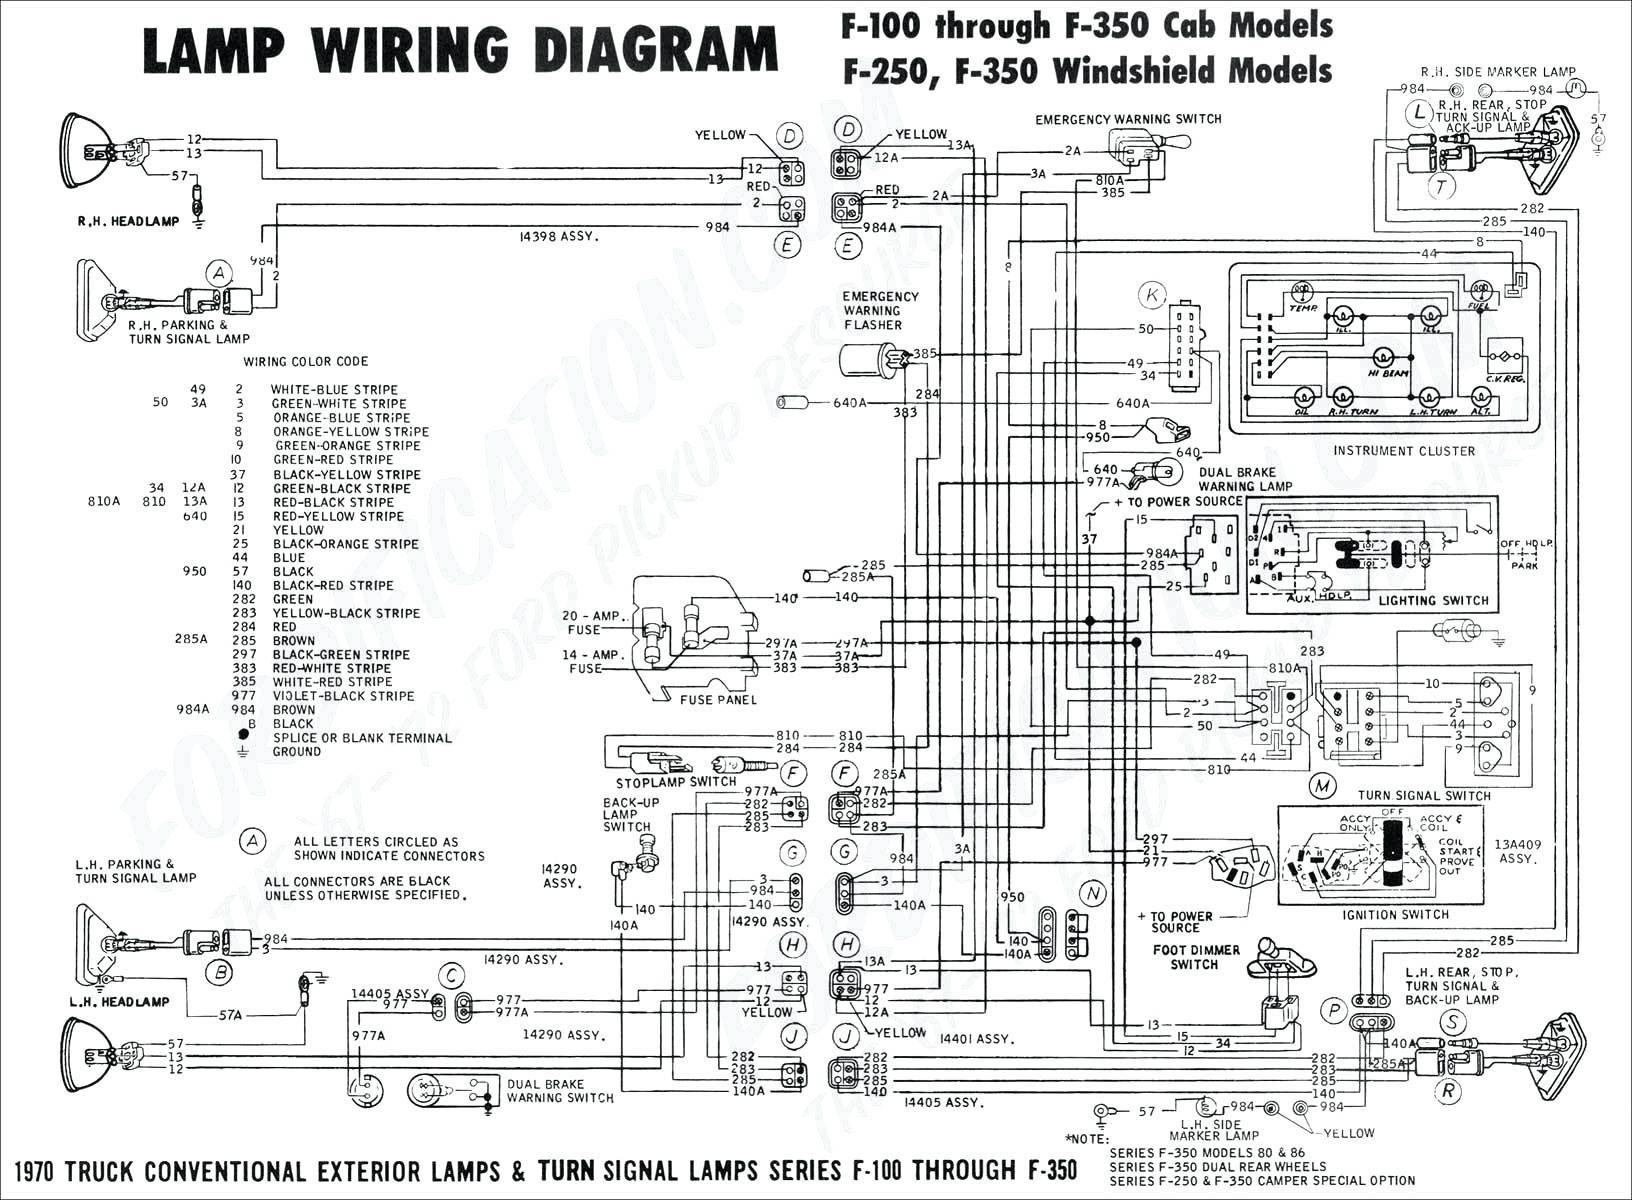 2004 taurus ses engine diagram wiring diagram database 97 Ford Ranger Engine Diagram